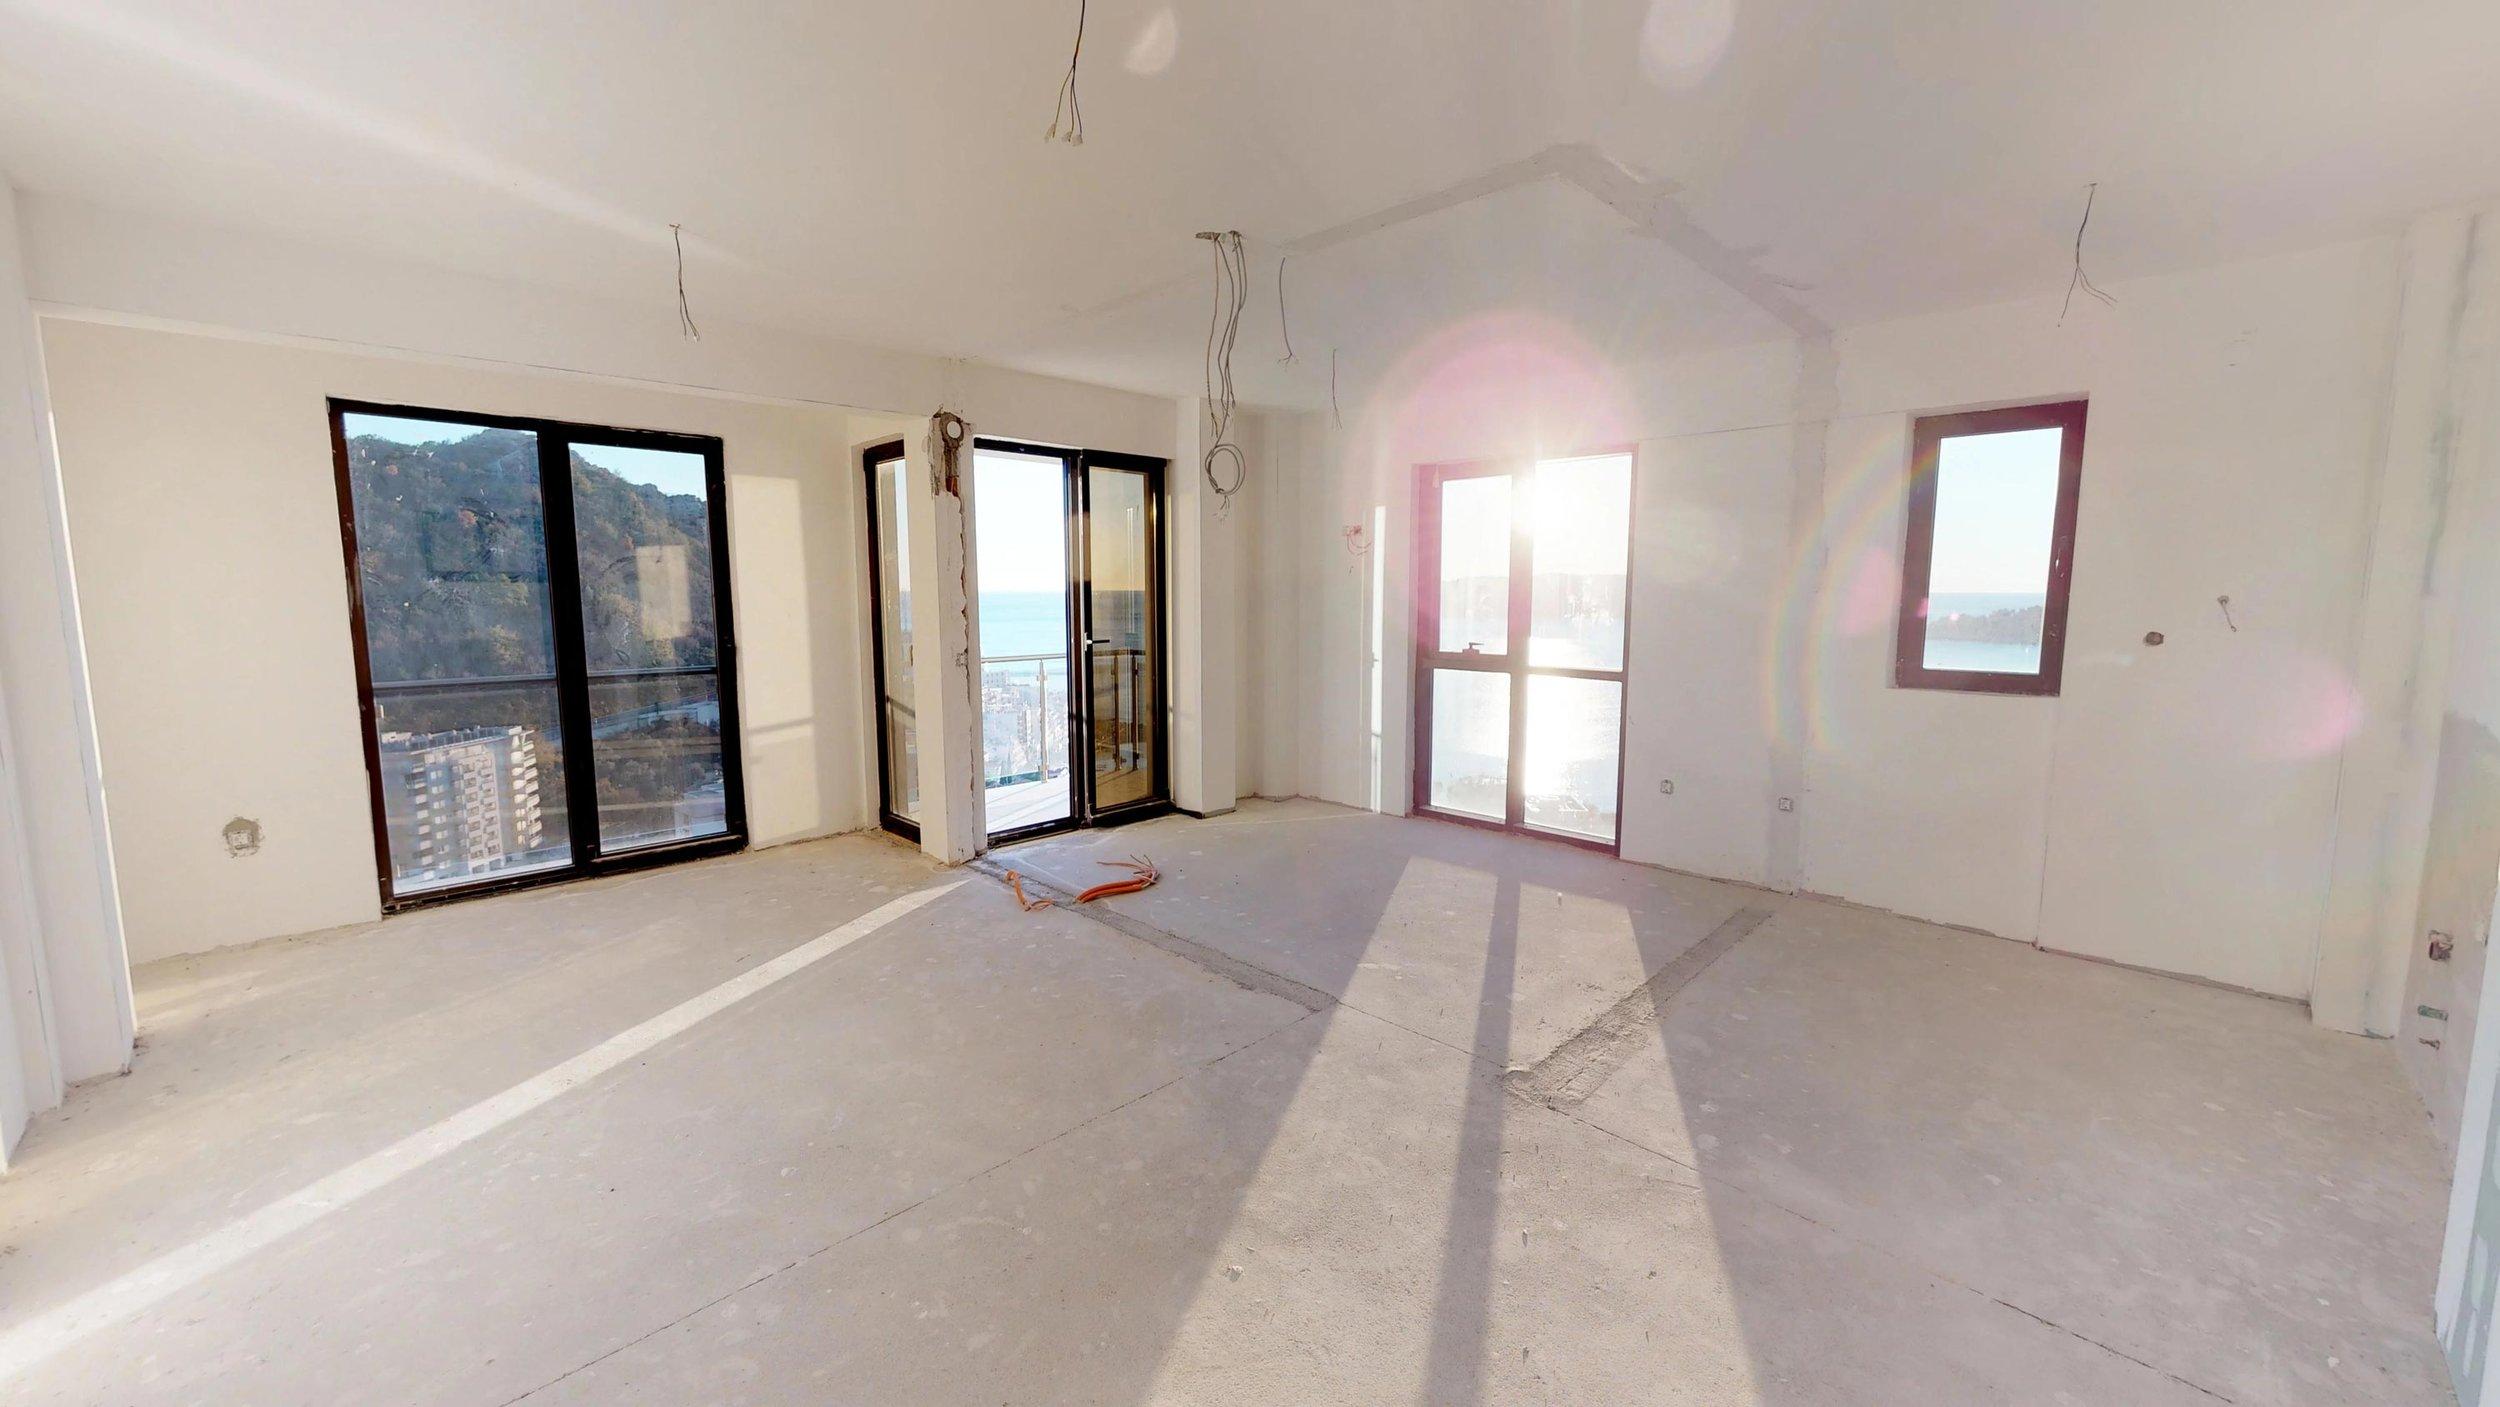 Penthouse-for-sale-in-rafailovice-Montenegro-(02).jpg